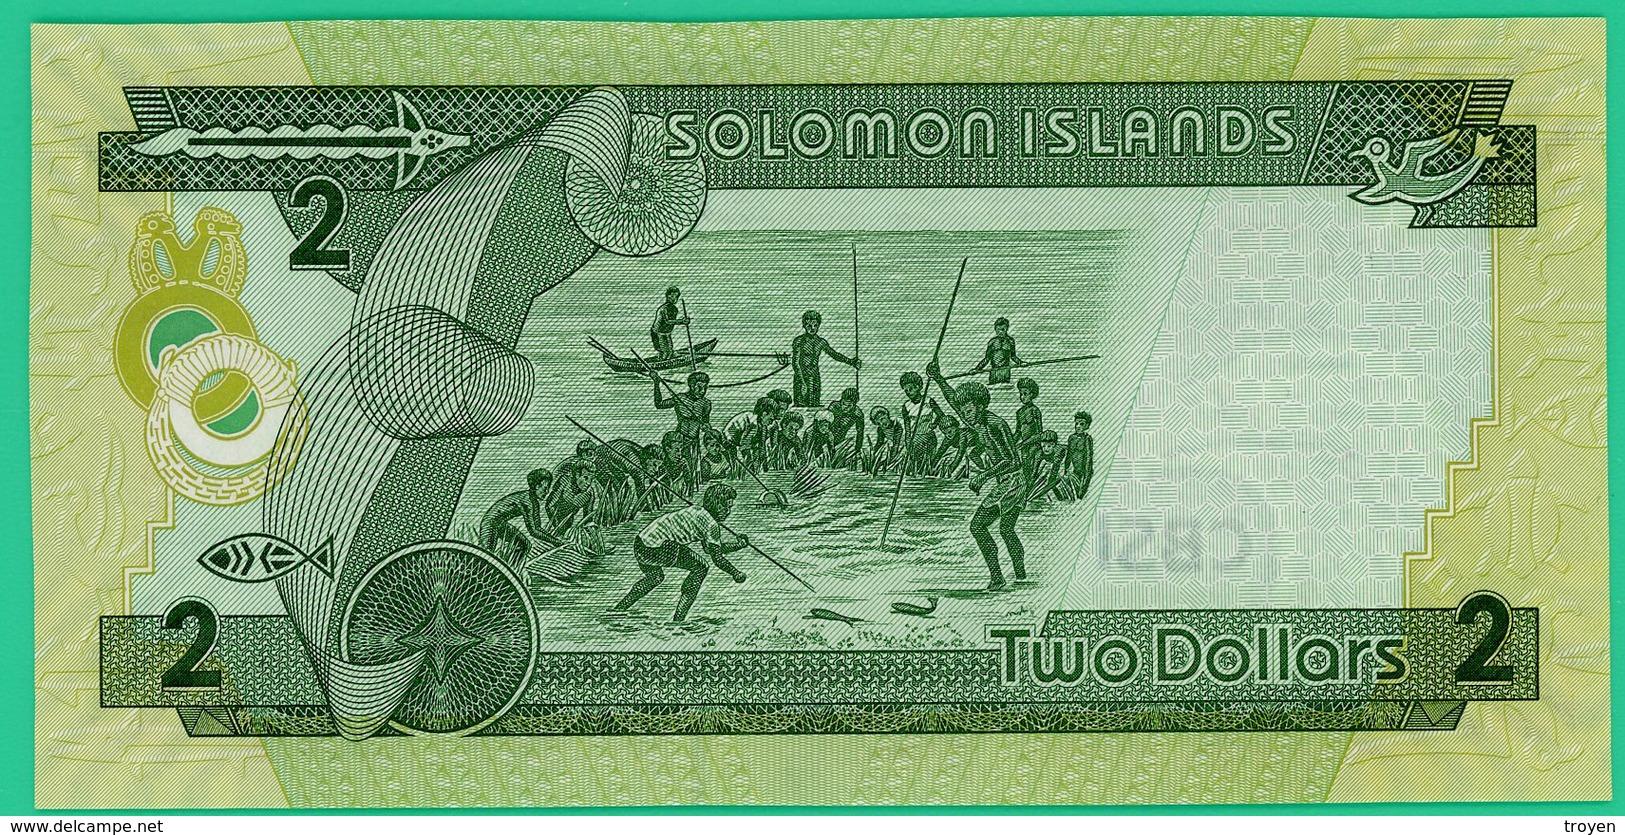 2 Dollars - Salomon Islande - N°. C/2 935417 - Neuf - - Iceland